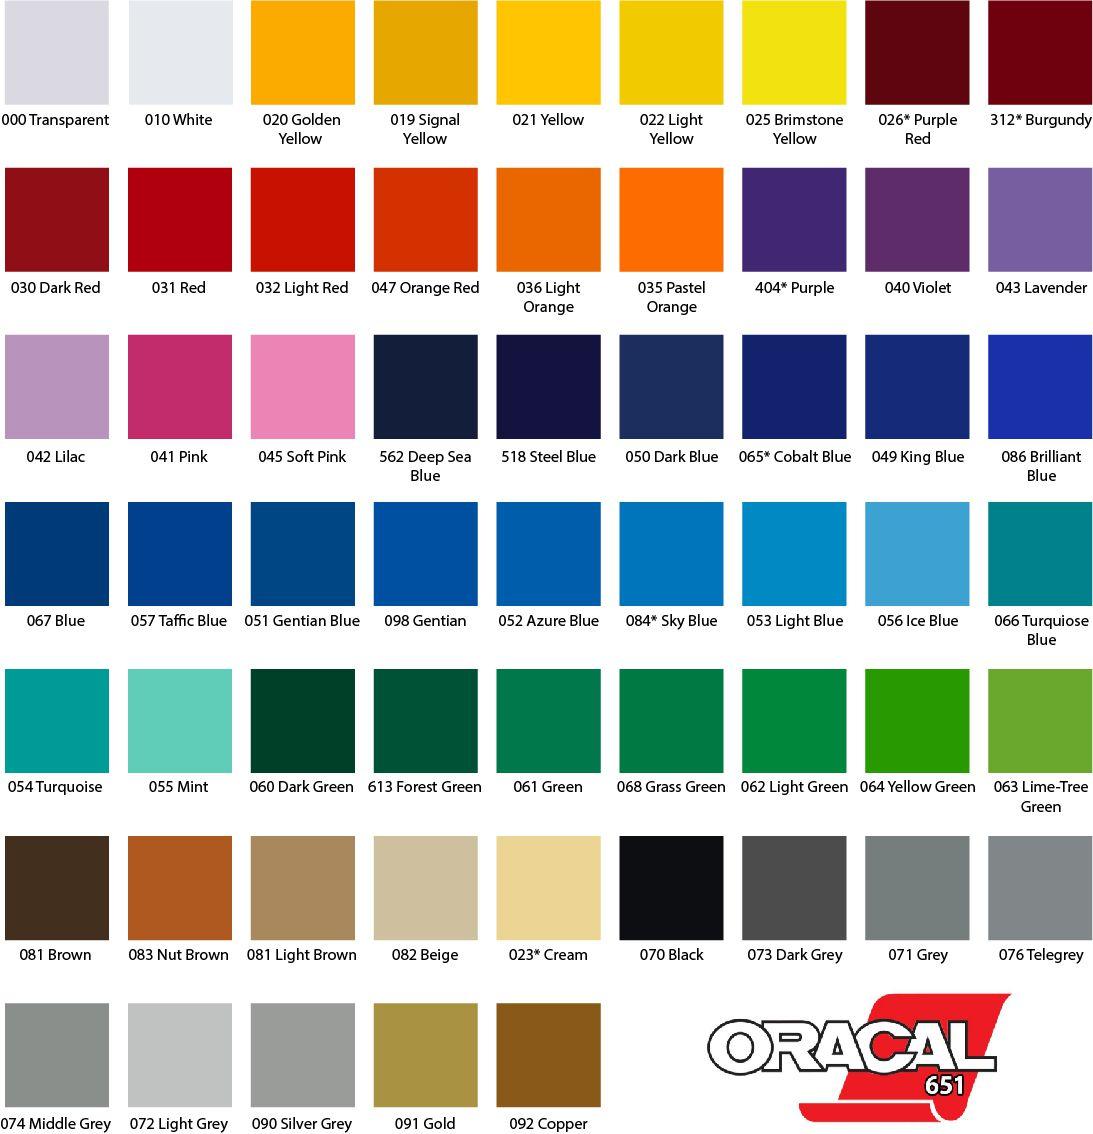 Adesivo Oracal 651 049 King Blue 1,26m x 1,00m